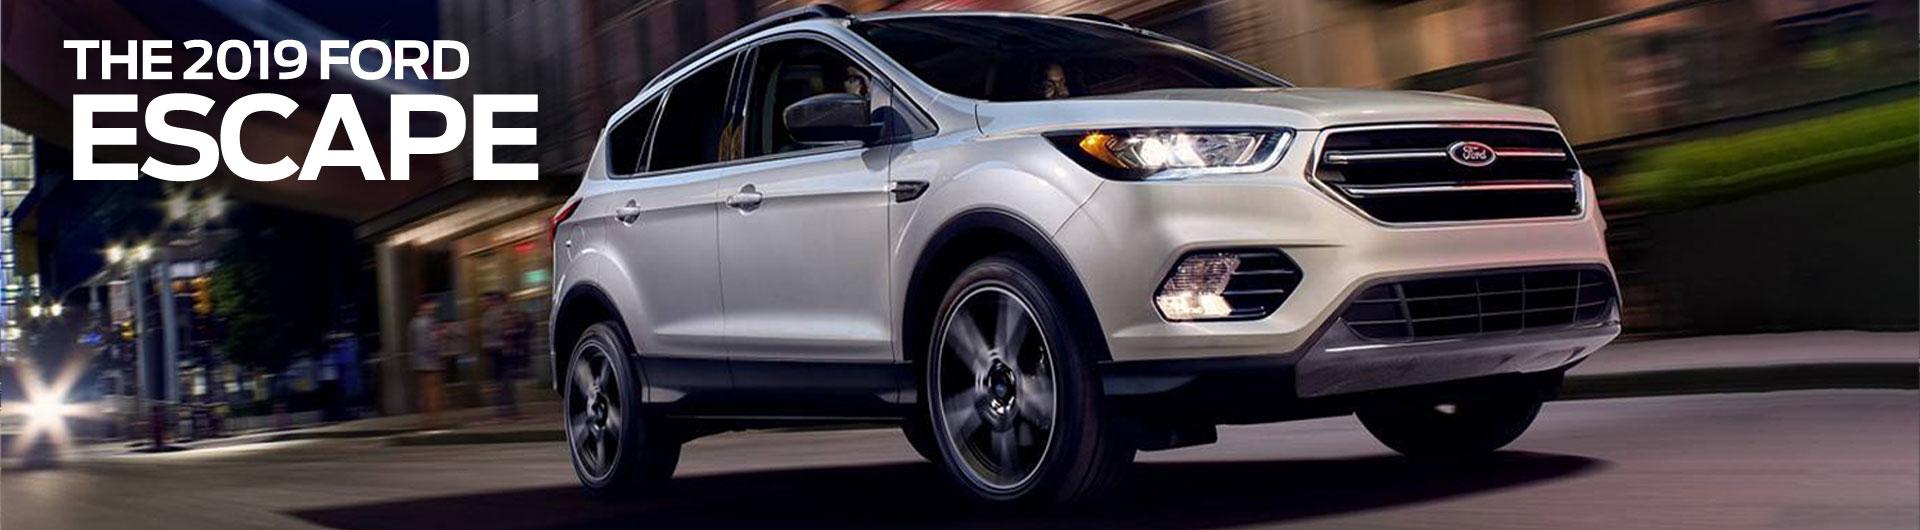 2019 Ford Escape Dealer In Oklahoma City Ok Joe Cooper Ford Of Edmond